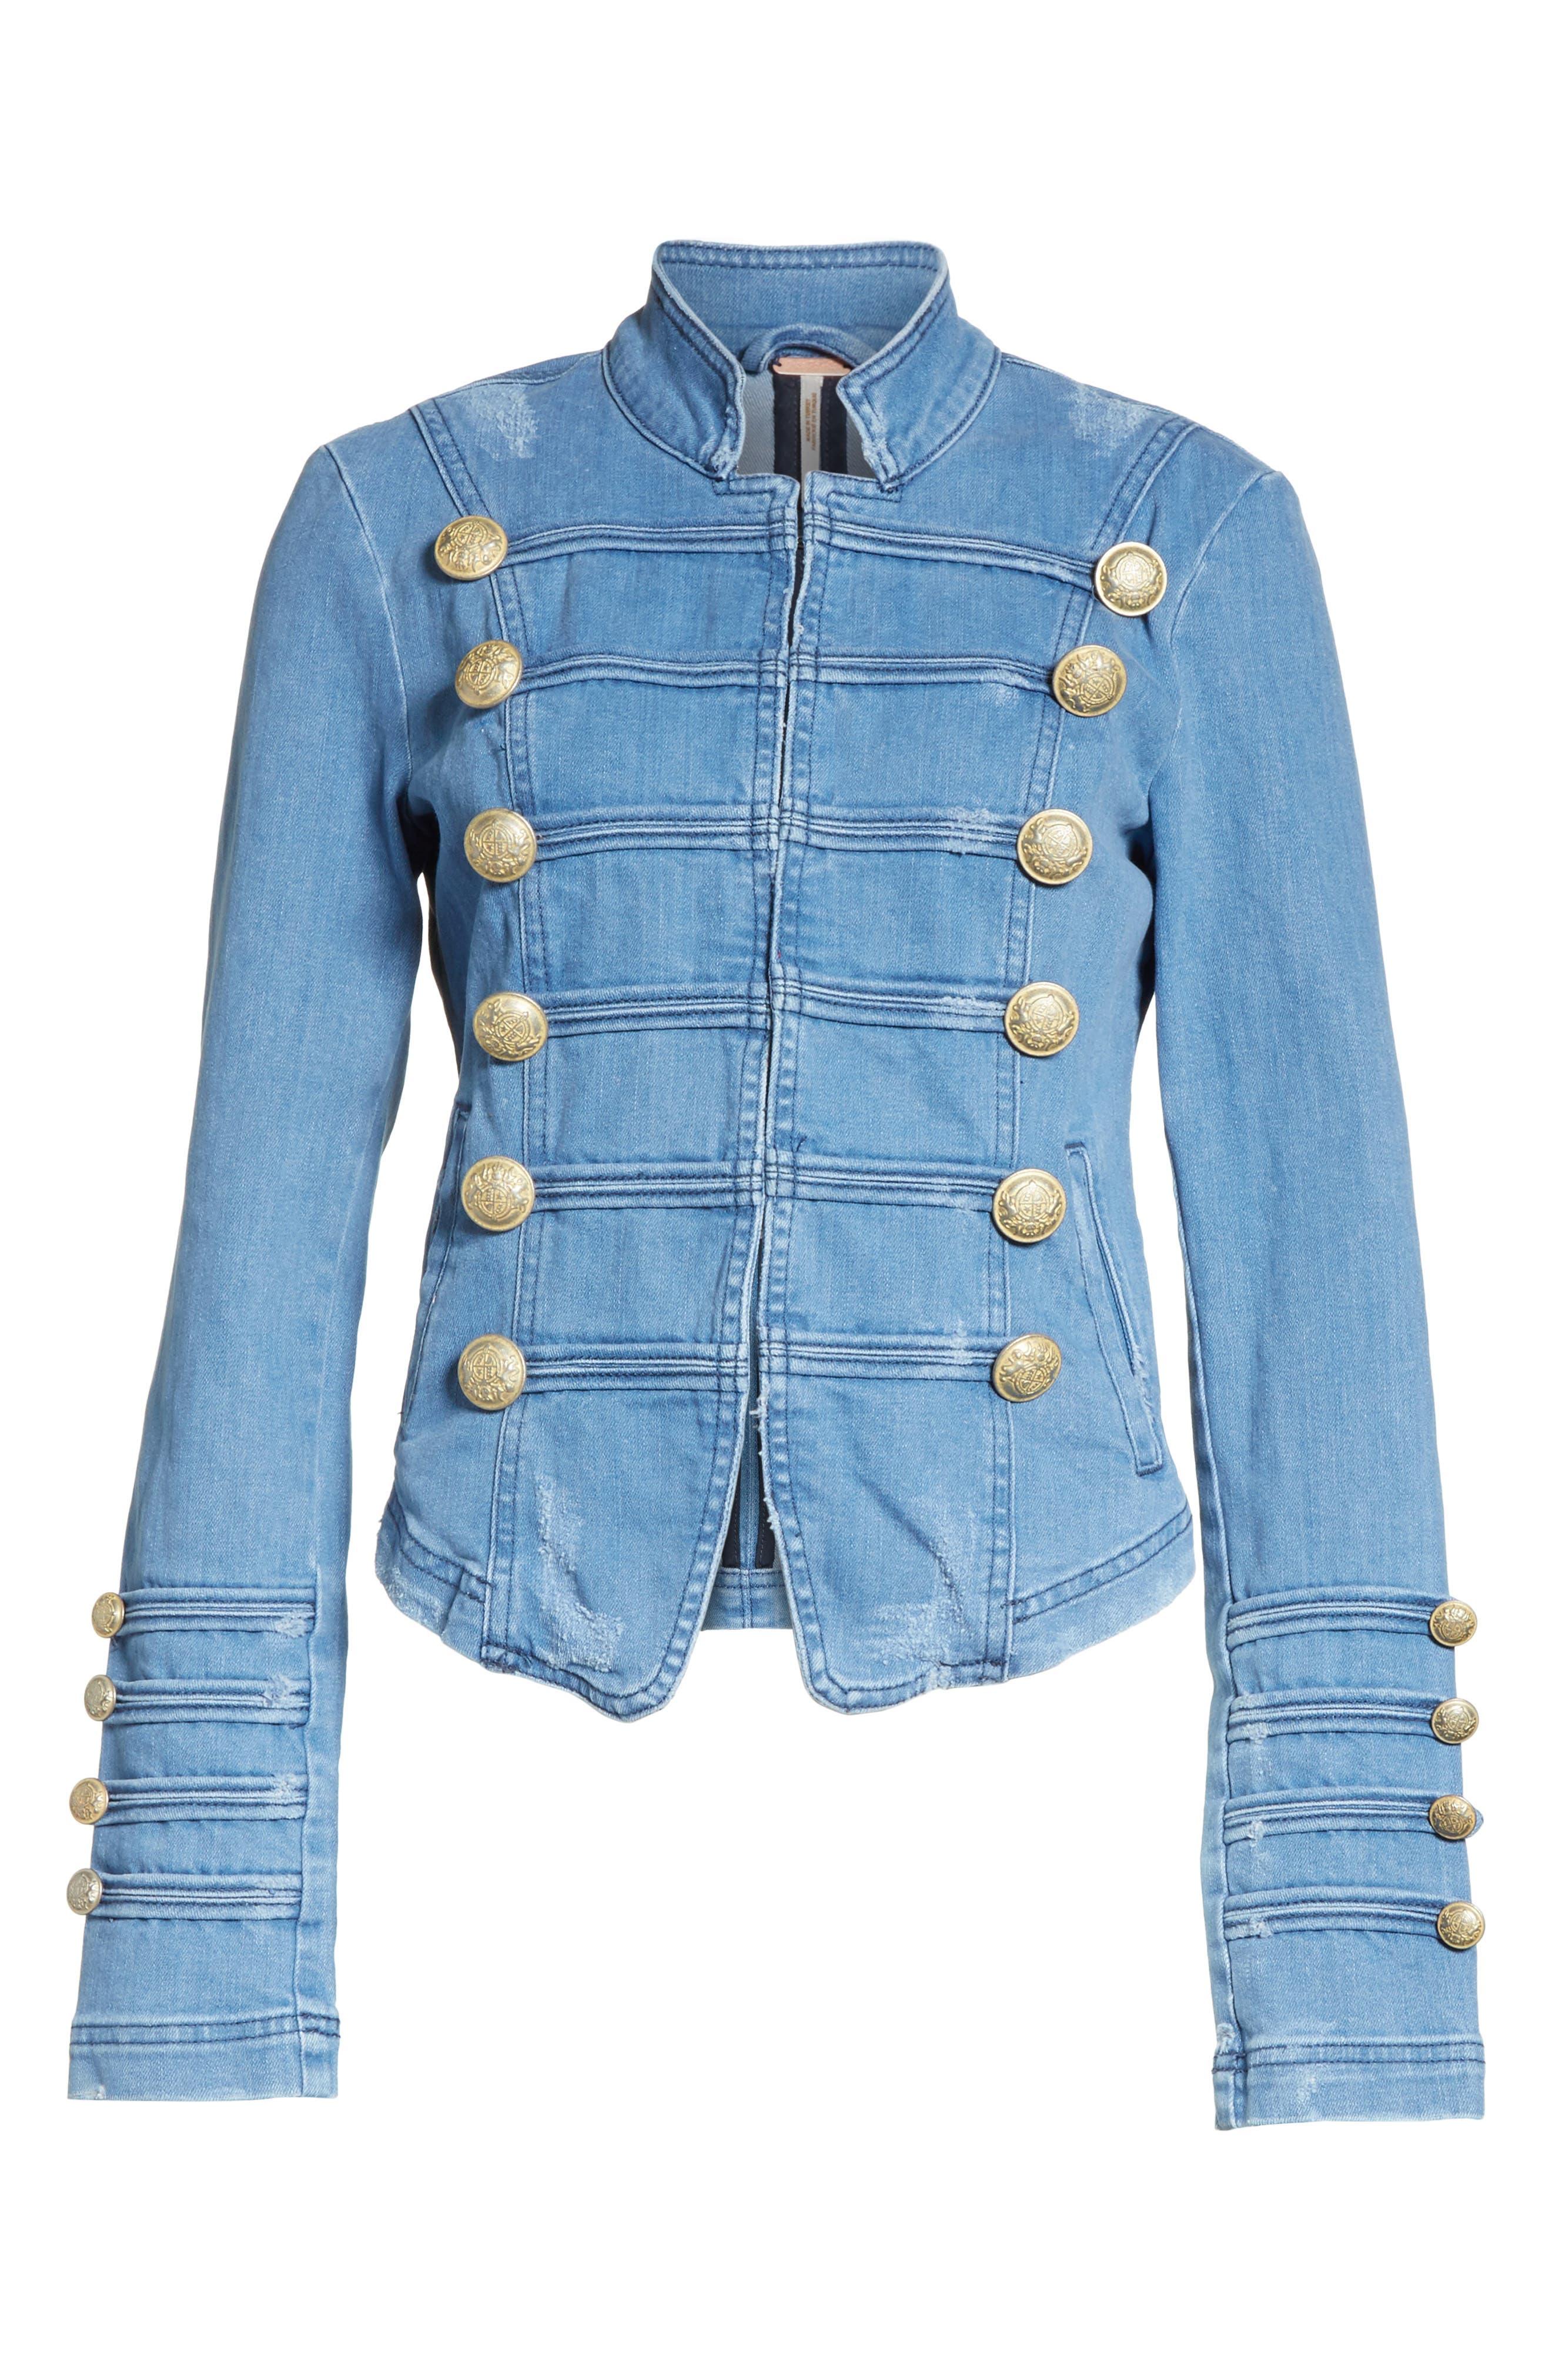 FREE PEOPLE,                             Military Denim Jacket,                             Alternate thumbnail 6, color,                             INDIGO BLUE